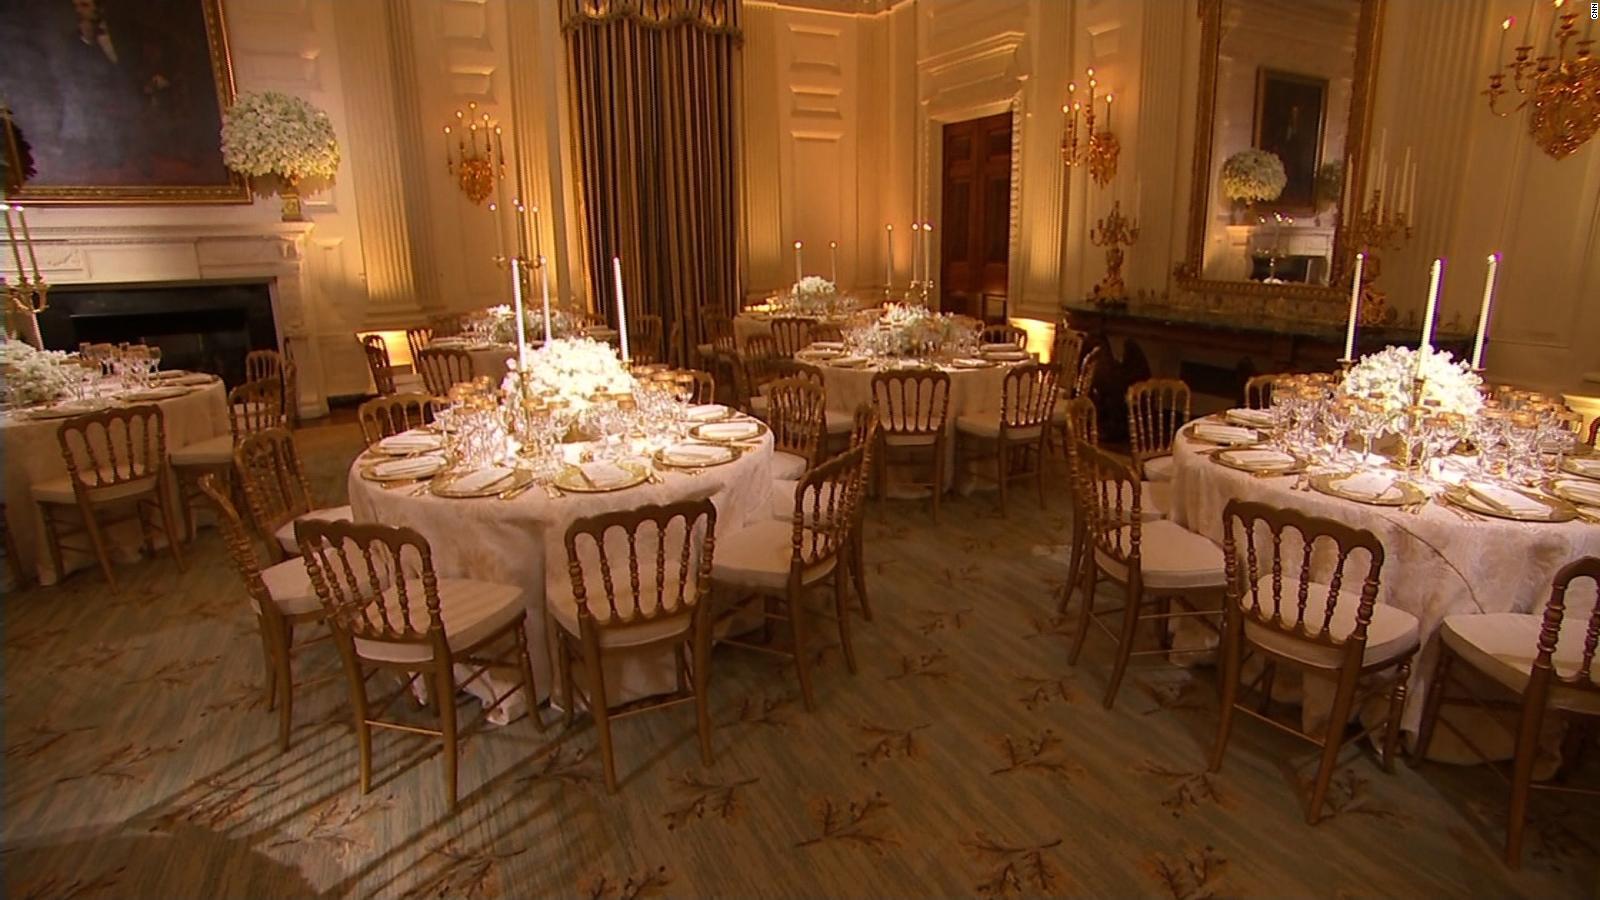 Melania Trump to announce formal platform Monday during Rose Garden ...